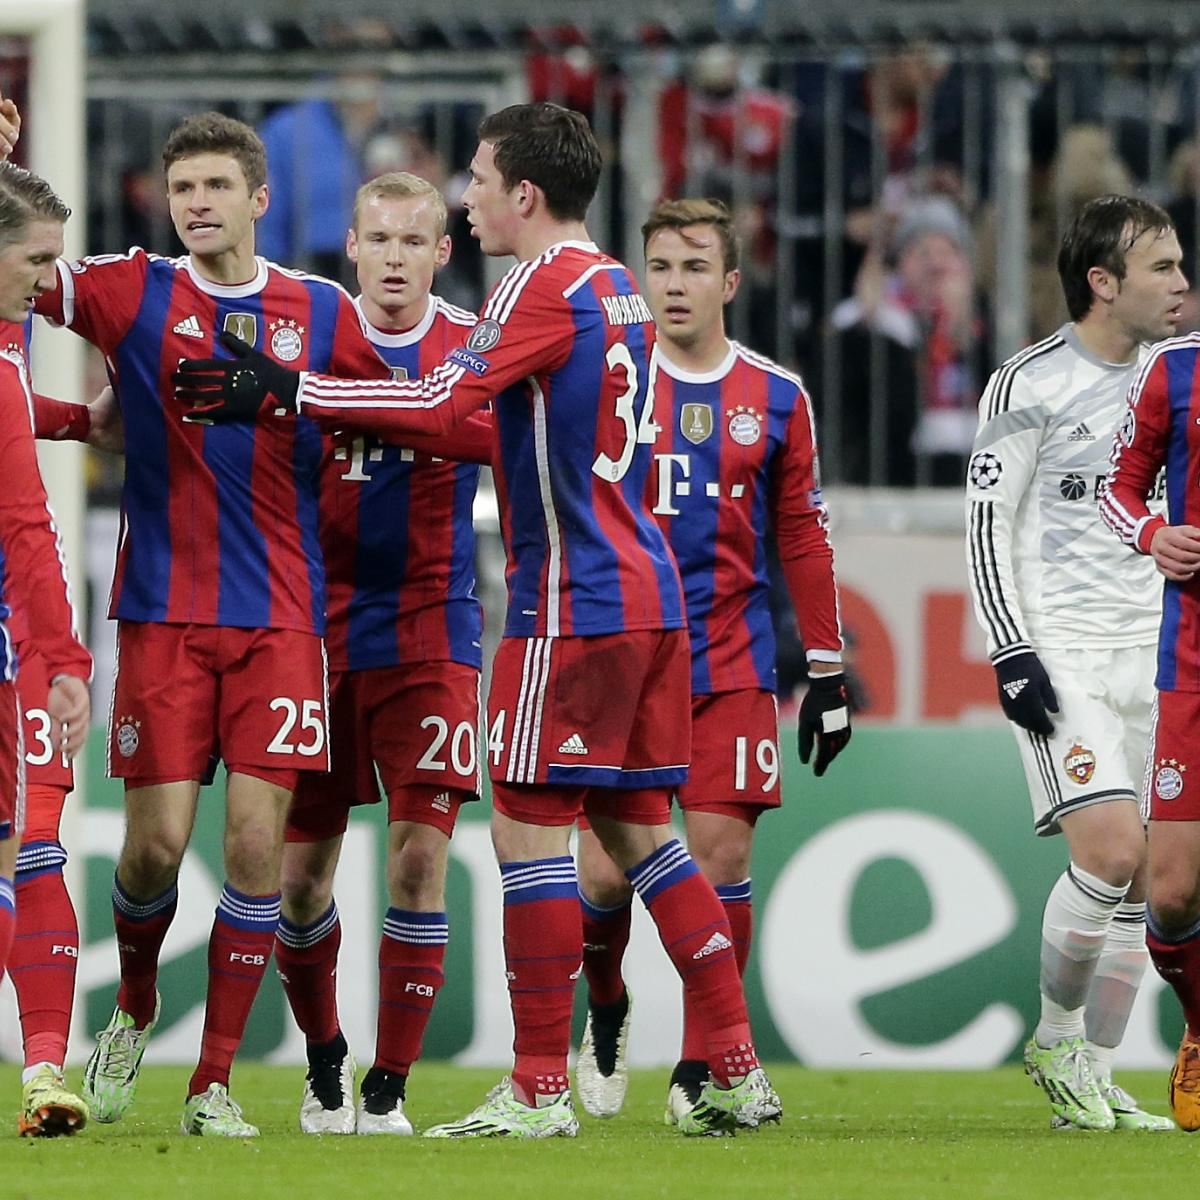 Psg Can Get Revenge On Chelsea In Champions League Last 16: UEFA Champions League 2014: Final Groups, Last-16 Teams